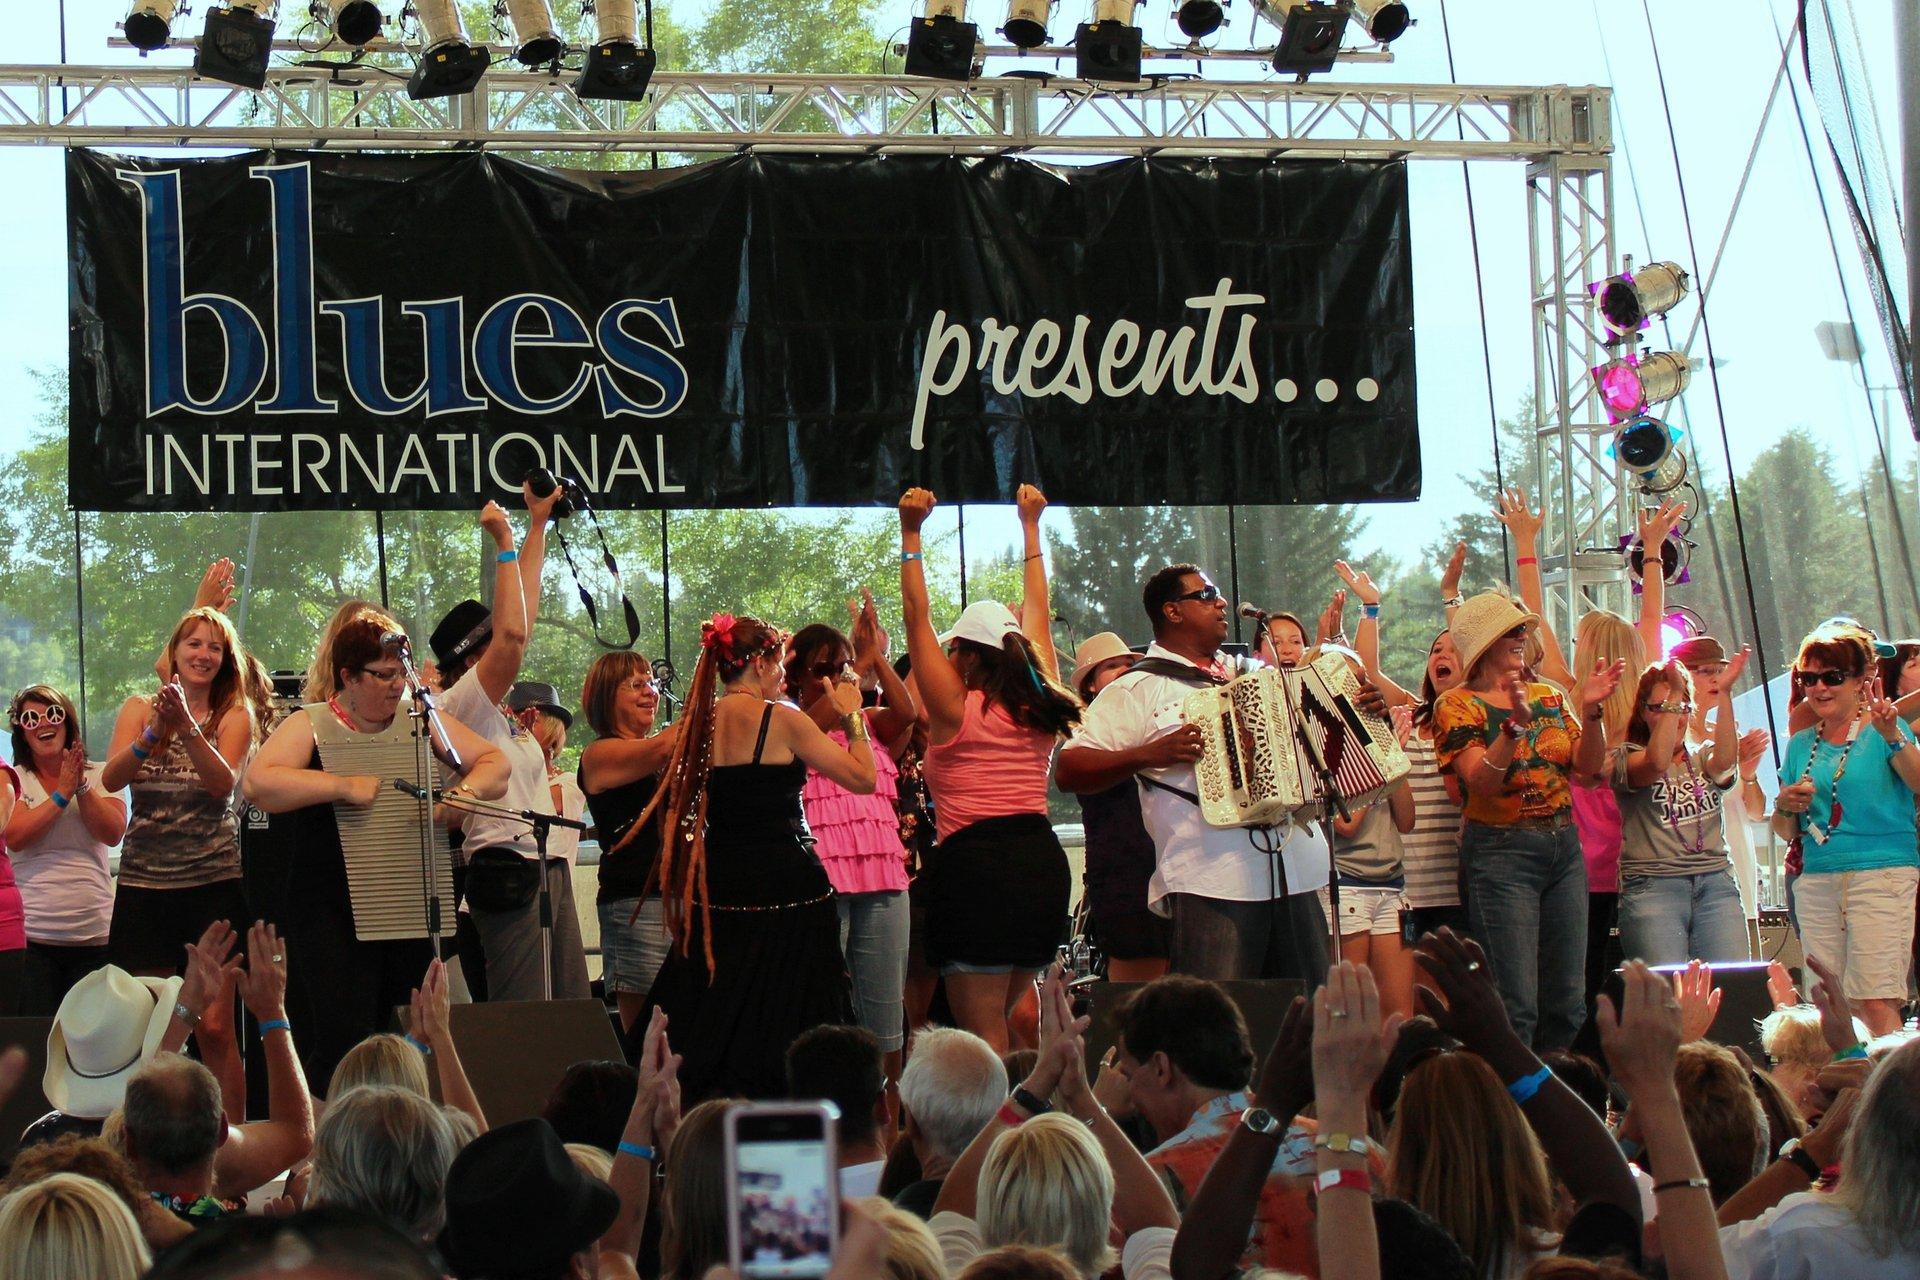 Best time for Edmonton Blues Festival in Edmonton 2020